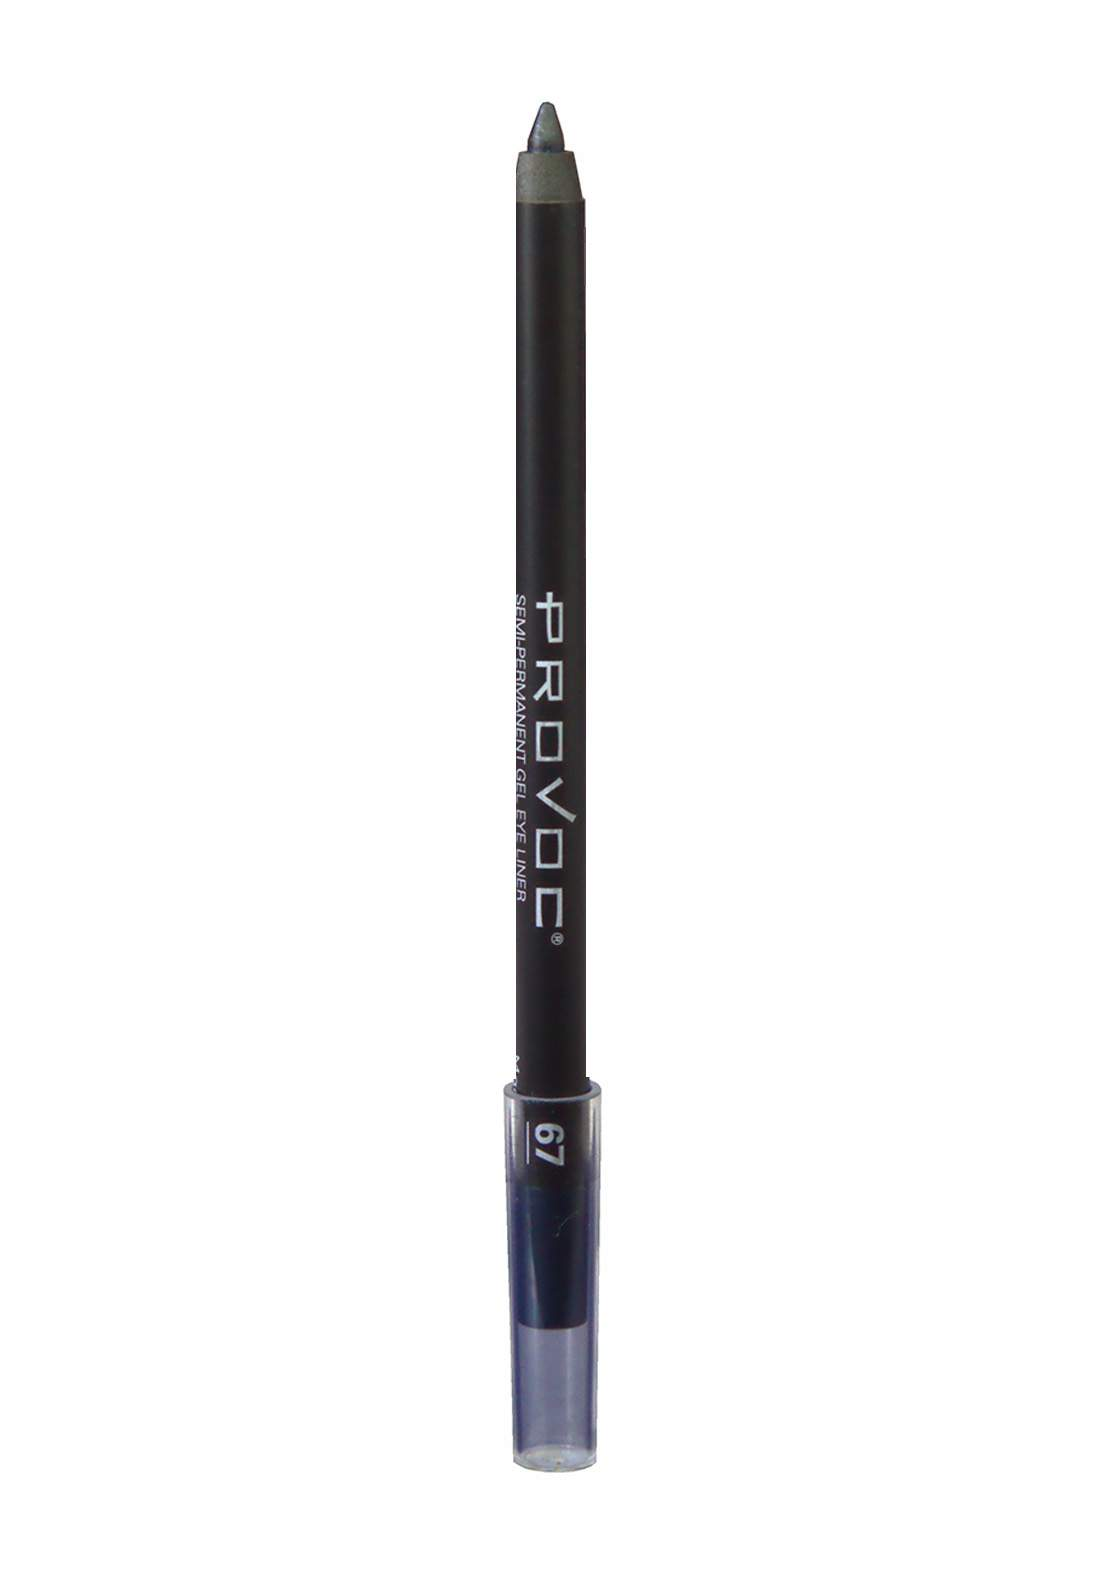 Provoc 353-0057 Semi-Permanent Gel Eye Liner  pencil No.67 Magnetic قلم محدد العيون